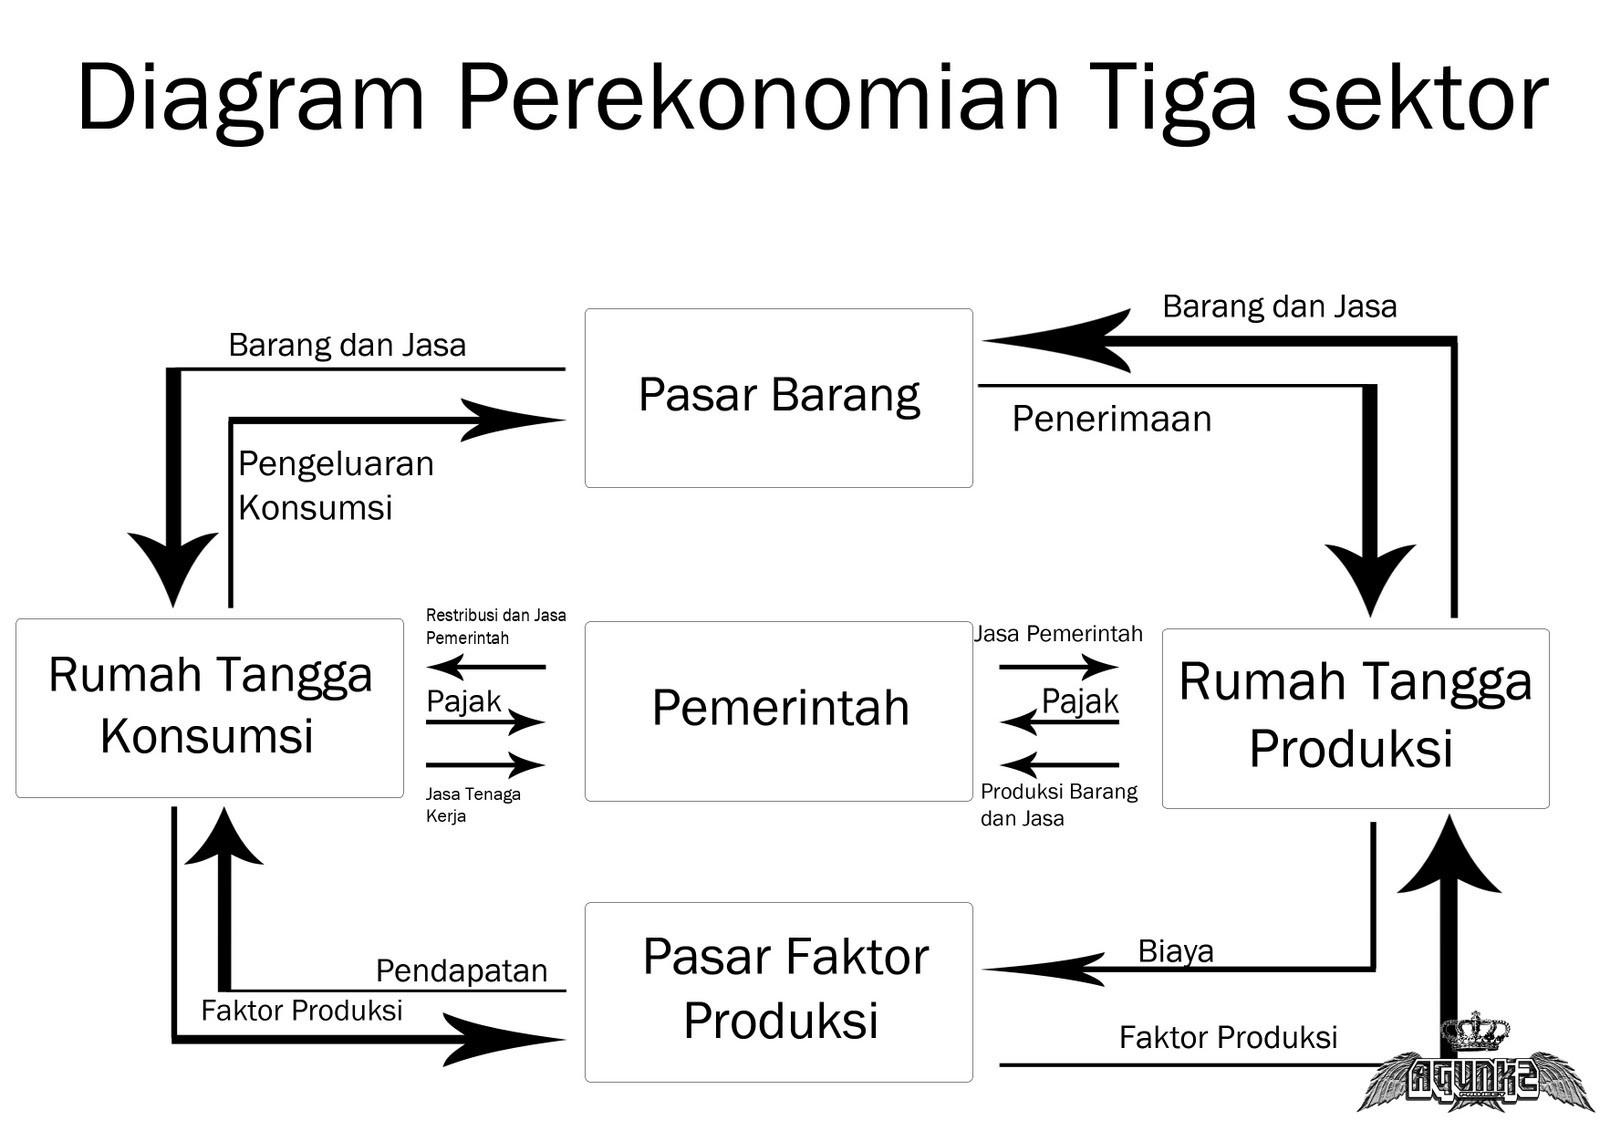 Diagram pelaku ekonomi 3 sektor perekonomian tertutup materi ekonomi diagram pelaku ekonomi 3 sektor ccuart Images